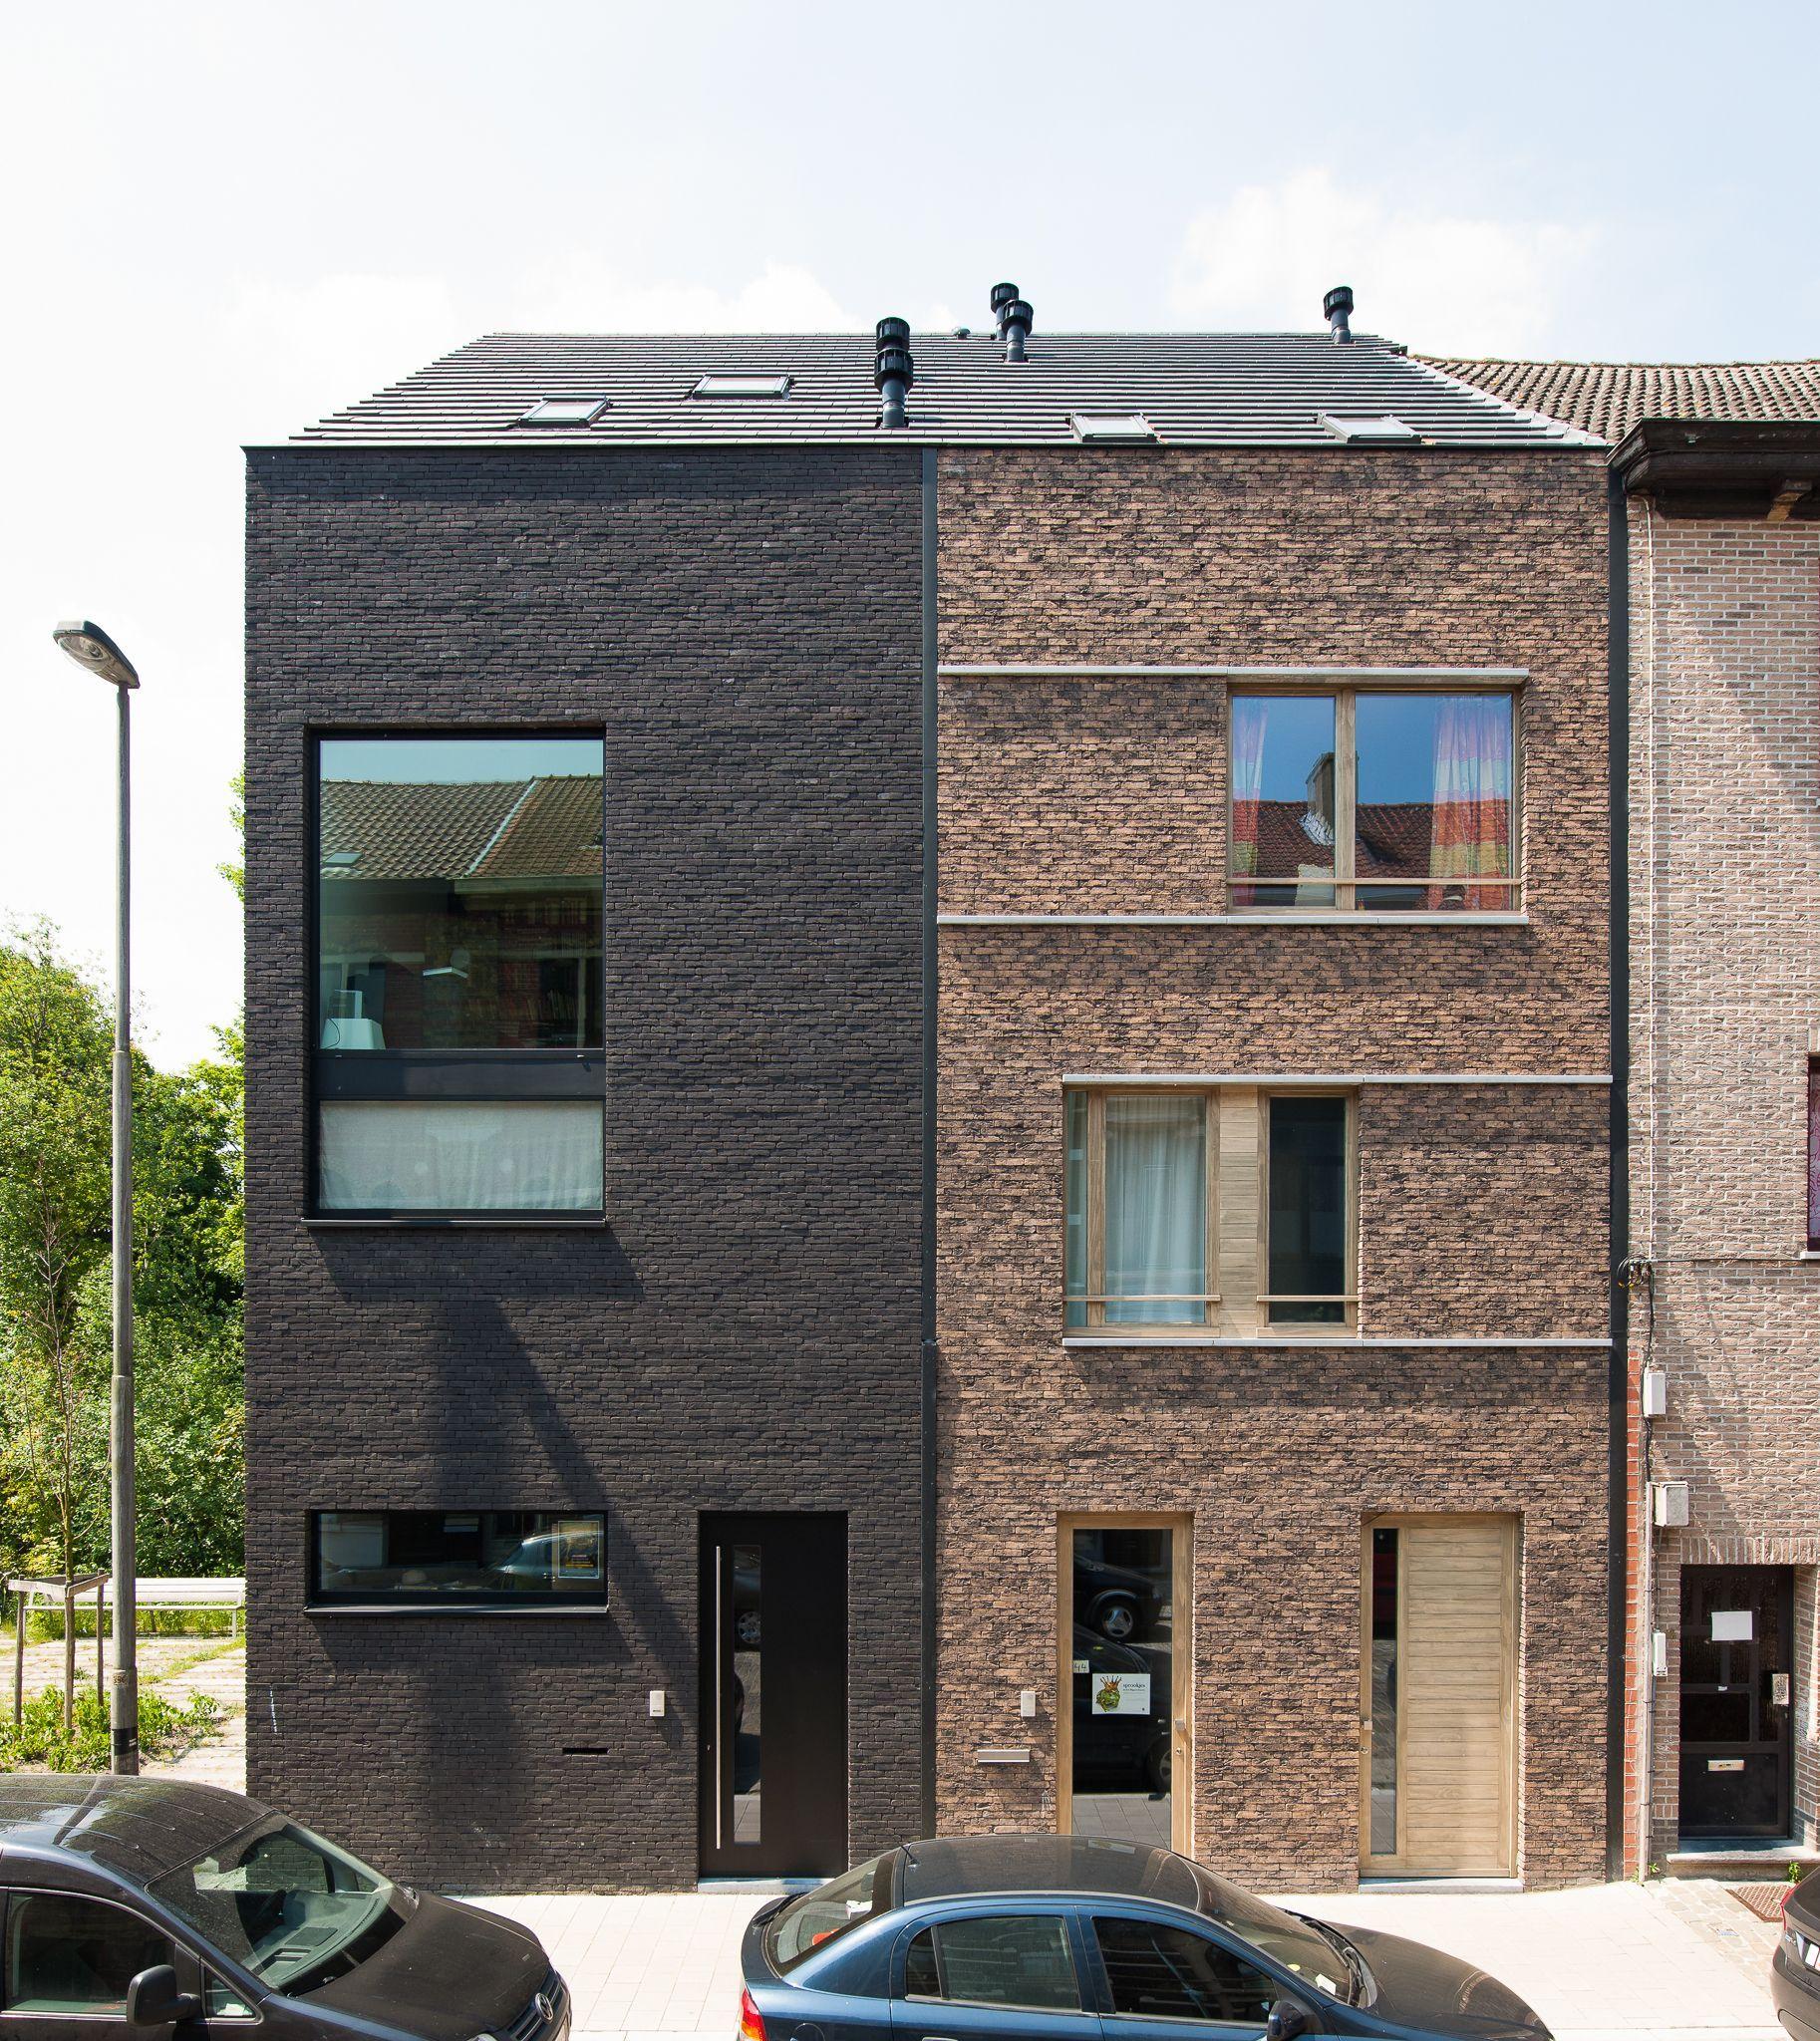 192 Shoreham Street by Project Orange | Arch windows, Sheffield ...